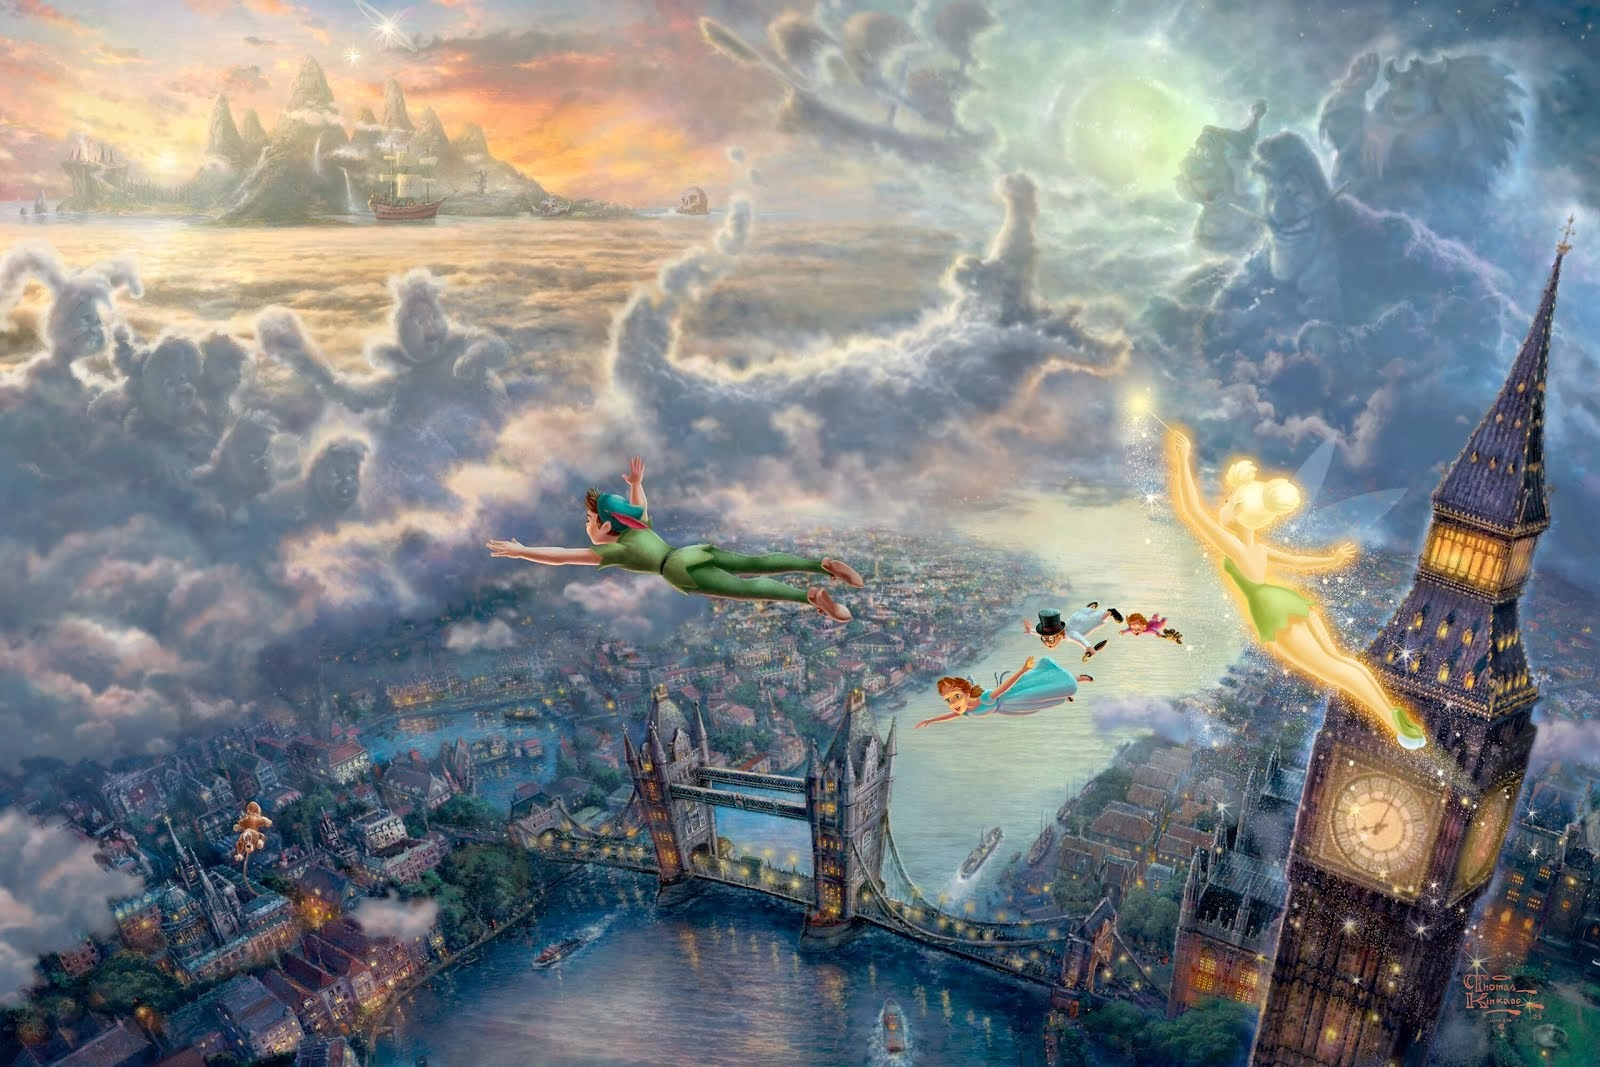 'Peter Pan' - Thomas Kinkade